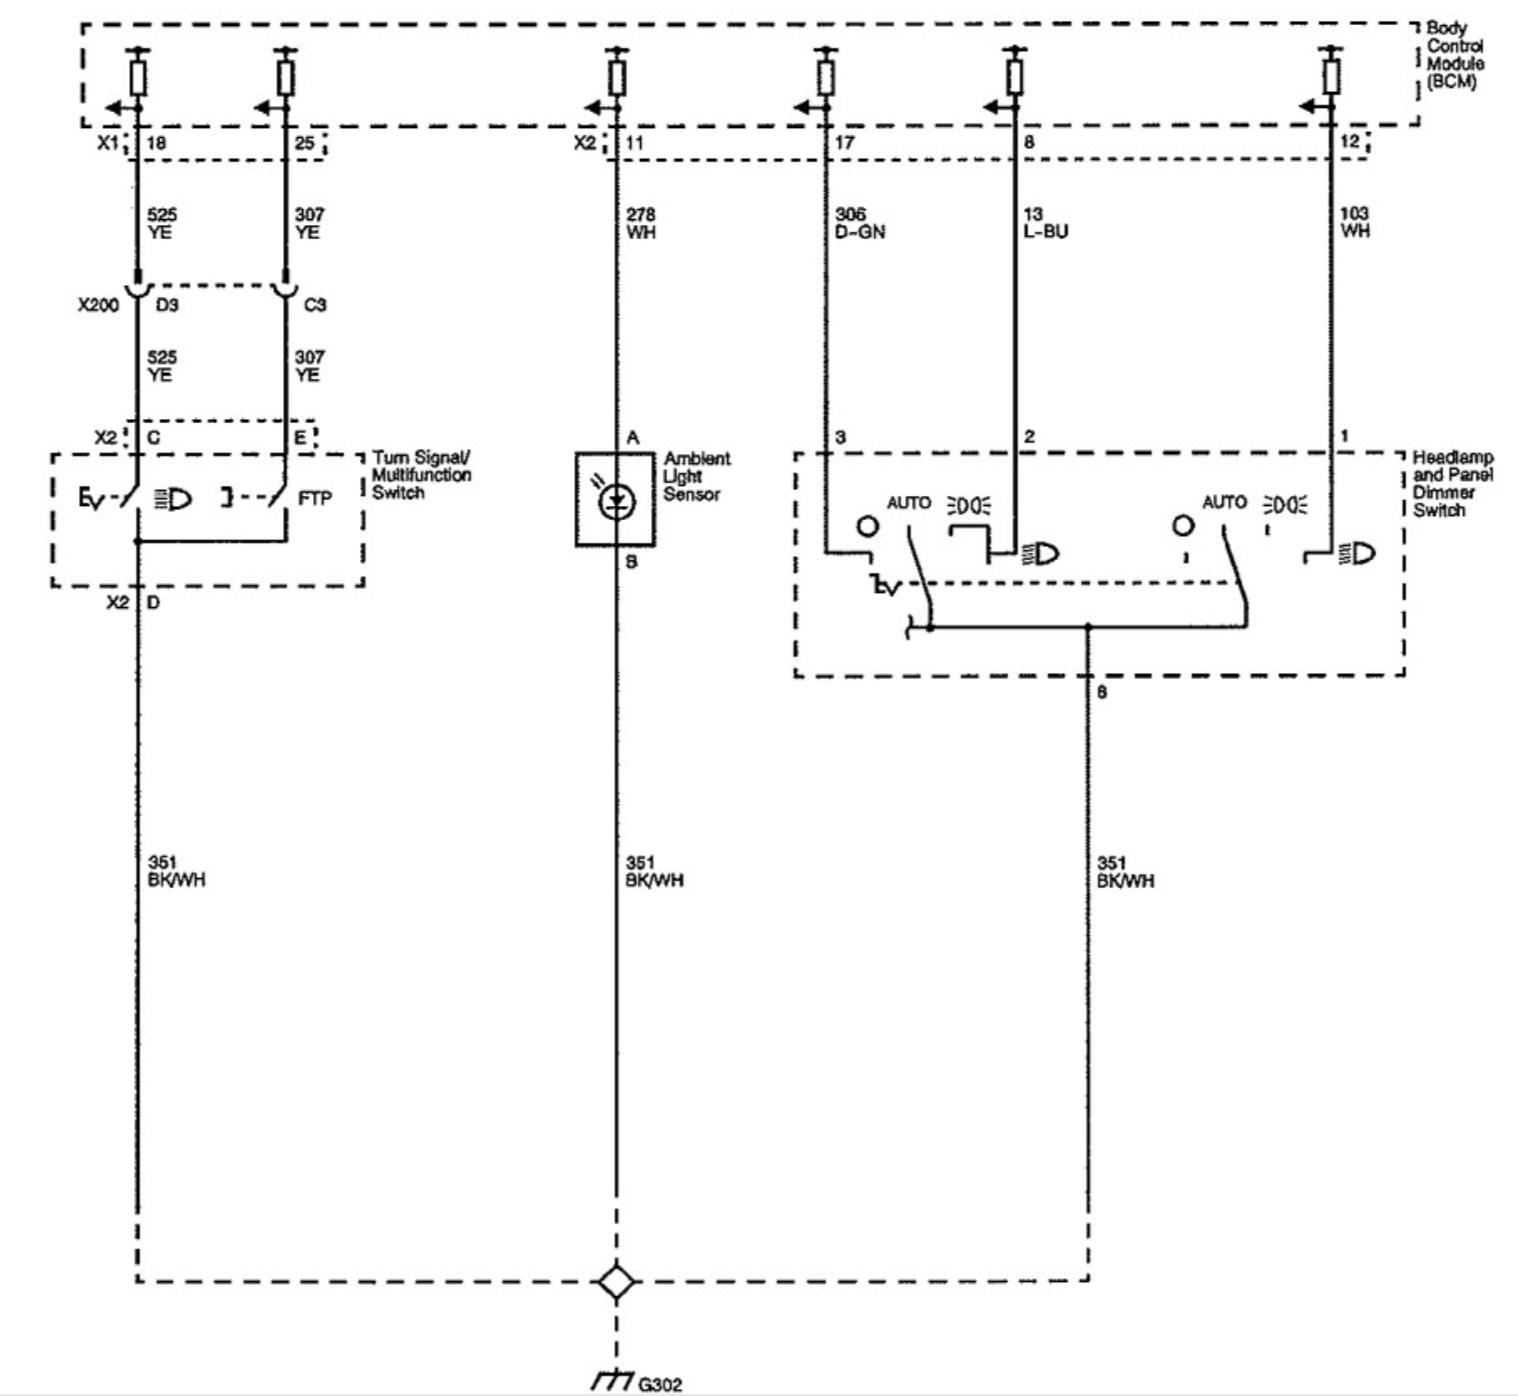 hight resolution of 2005 savana no headlights need diagram screen shot 2017 09